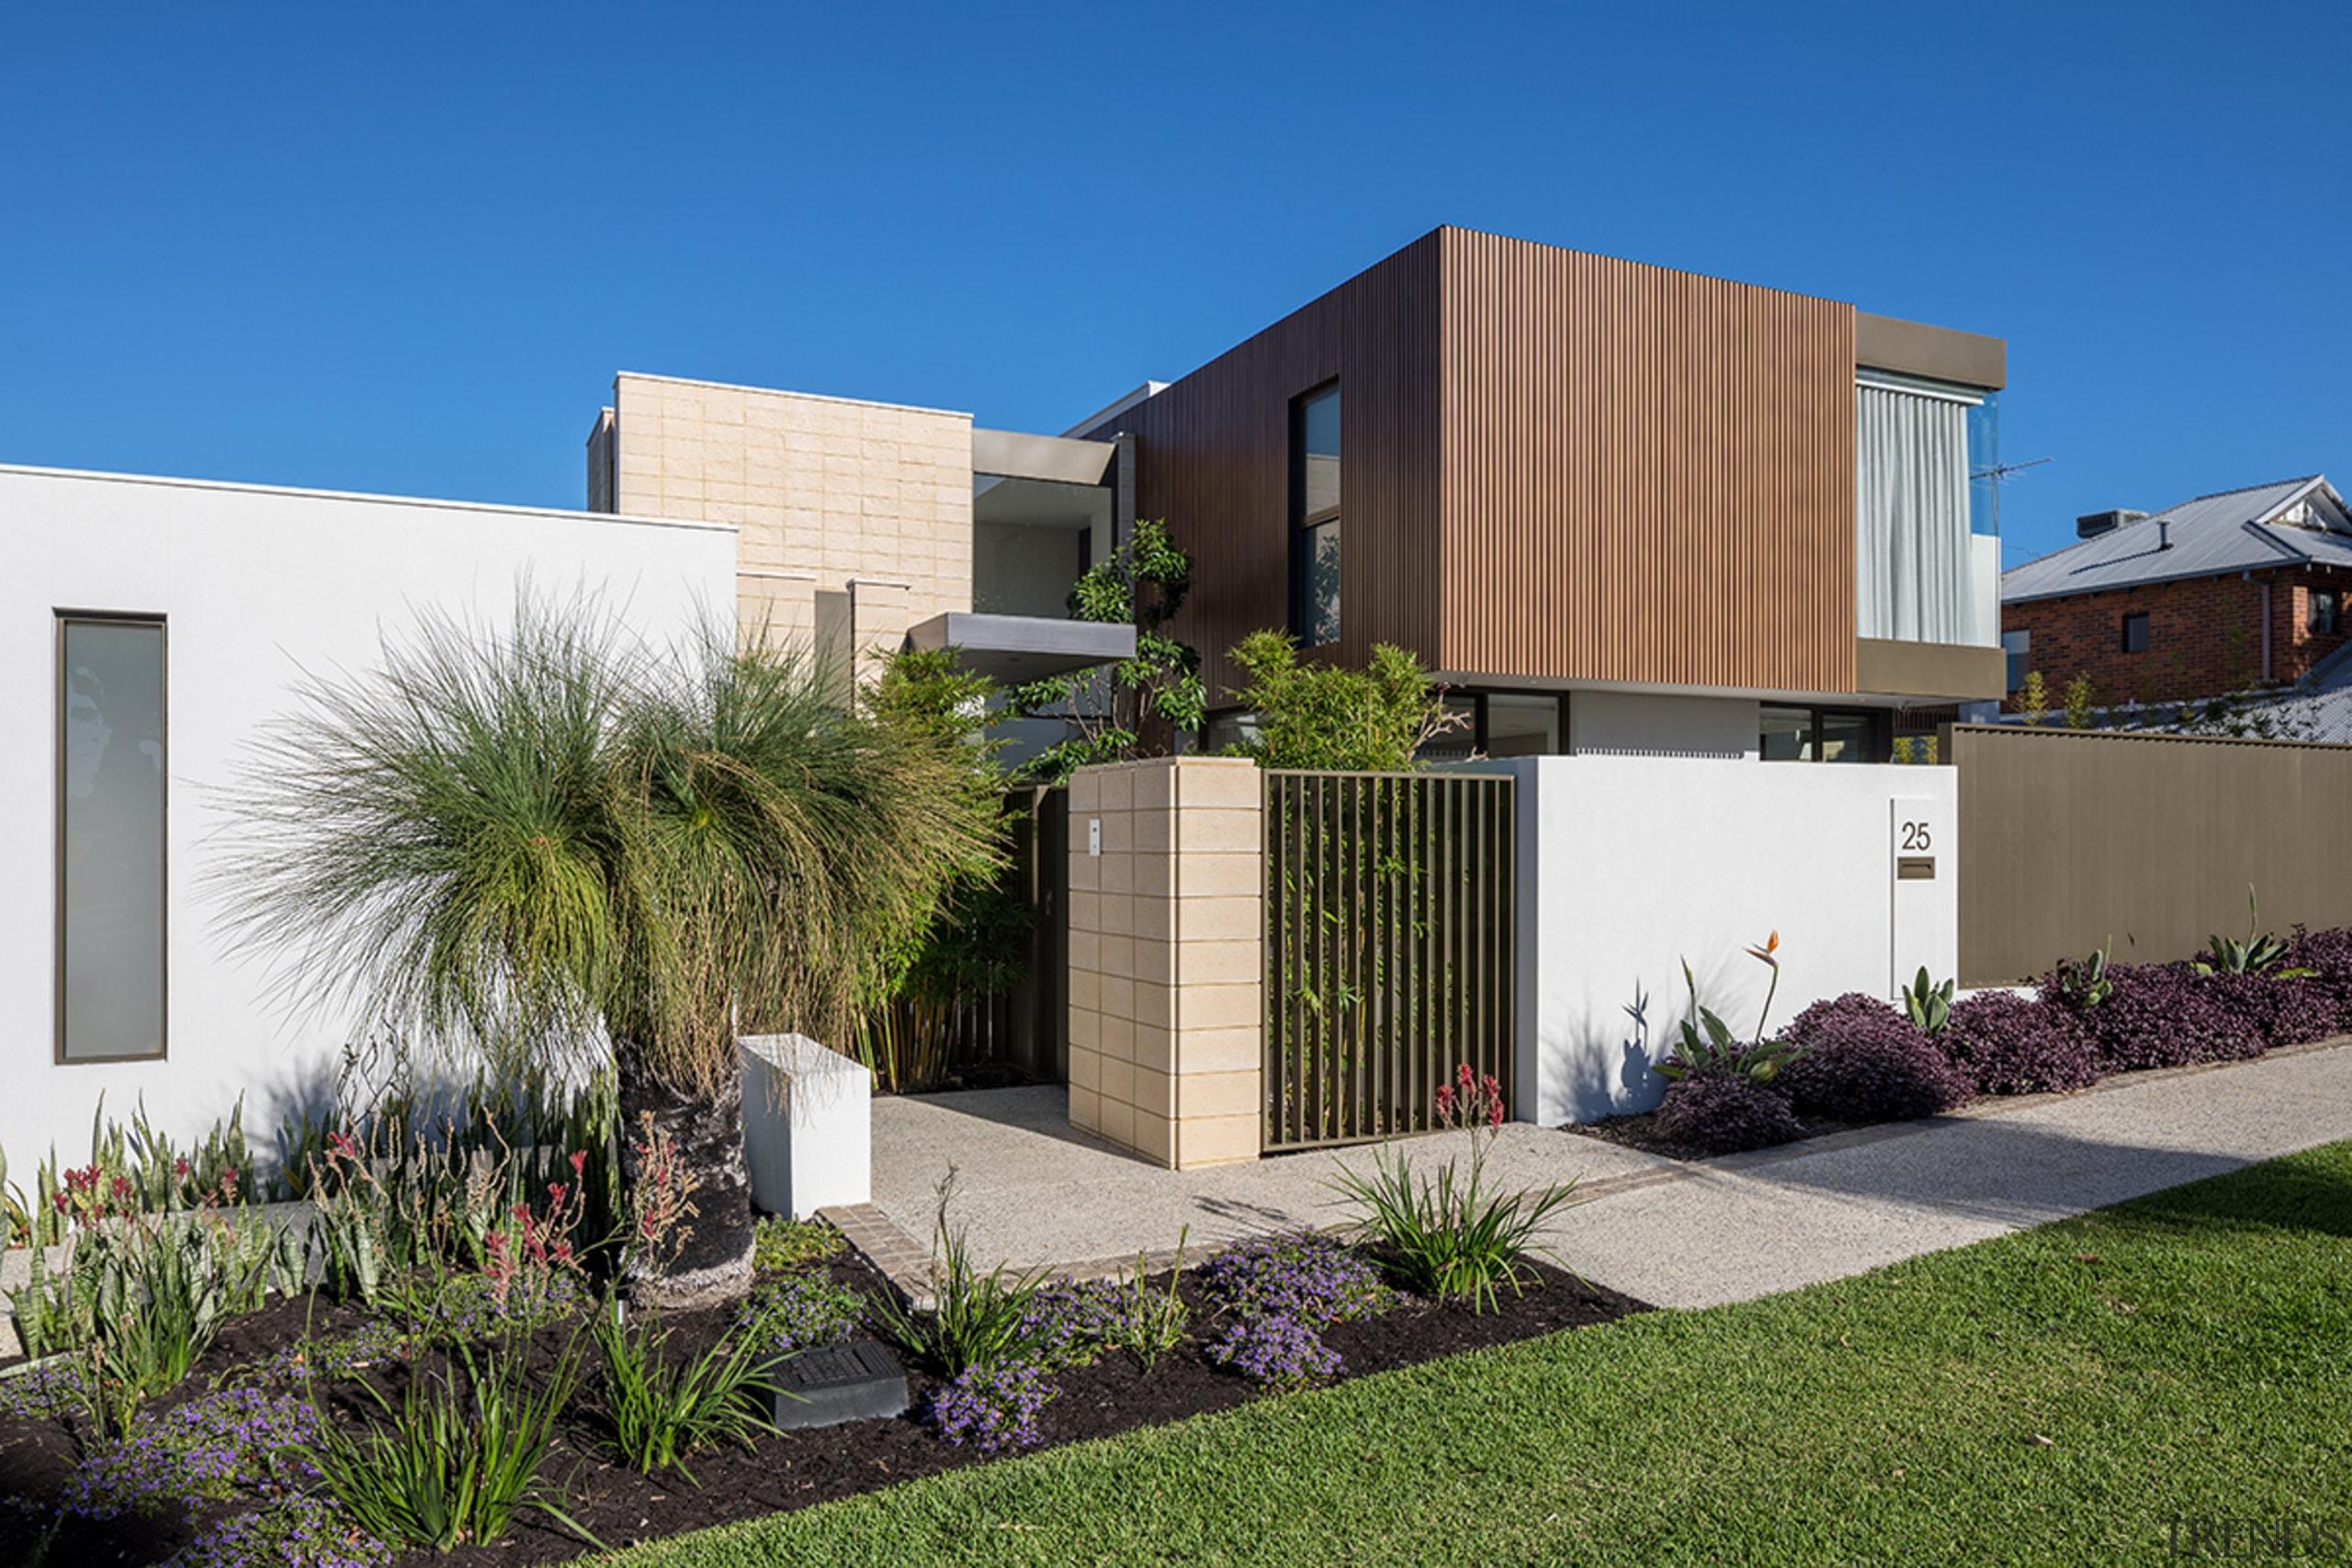 Daniel Lomma Design, Perth. See the full